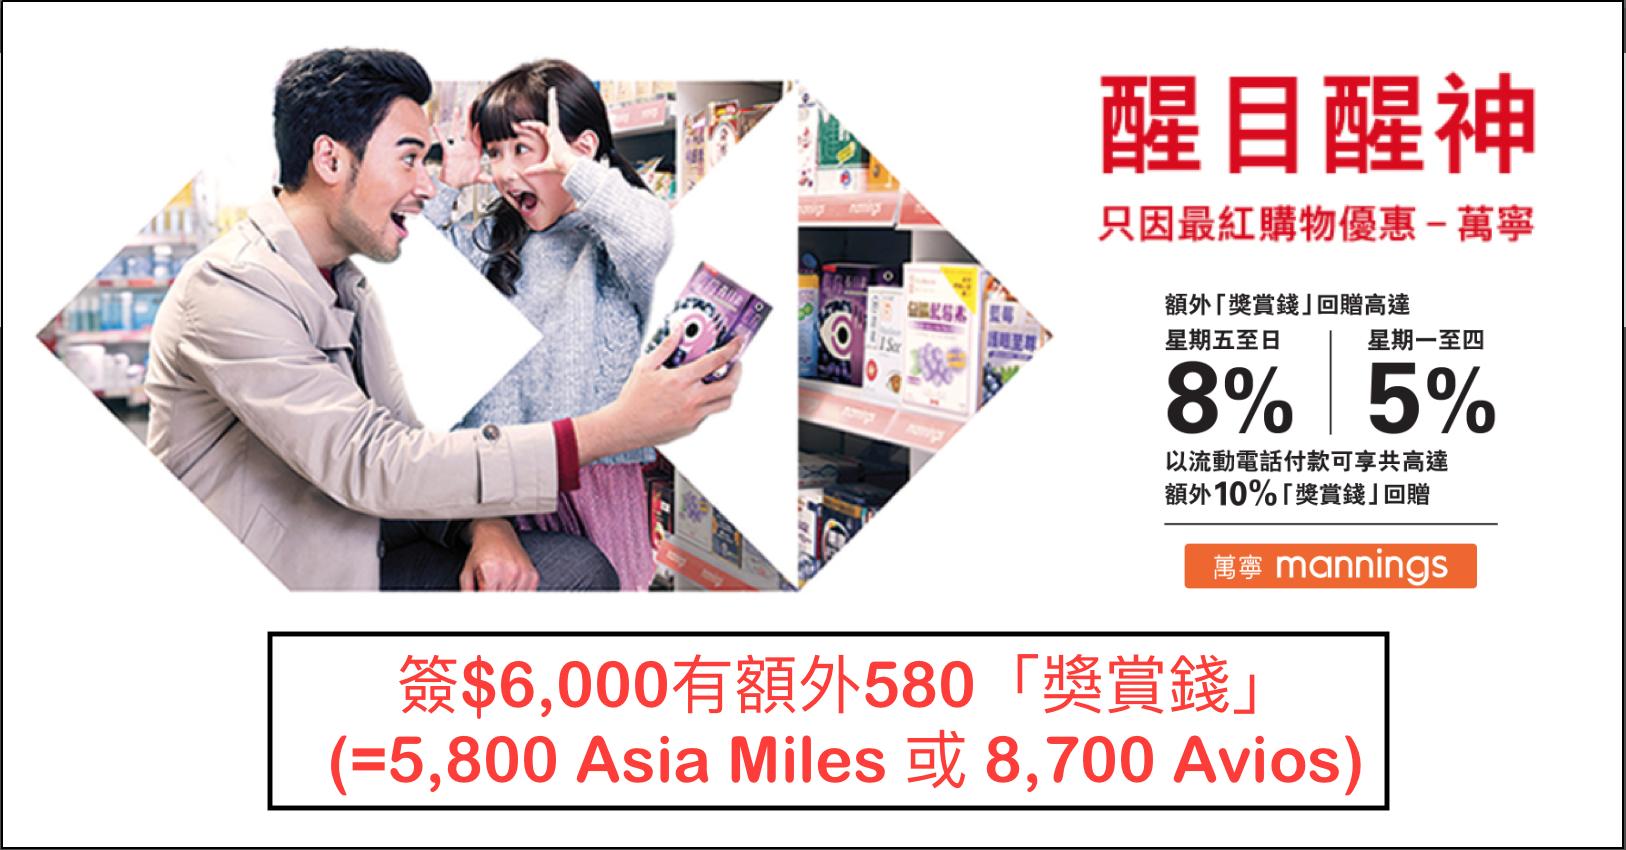 HSBC 最紅購物優惠 - 萬寧!簽$6,000有額外580「獎賞錢」(=5,800 Asia Miles 或 8,700 Avios)